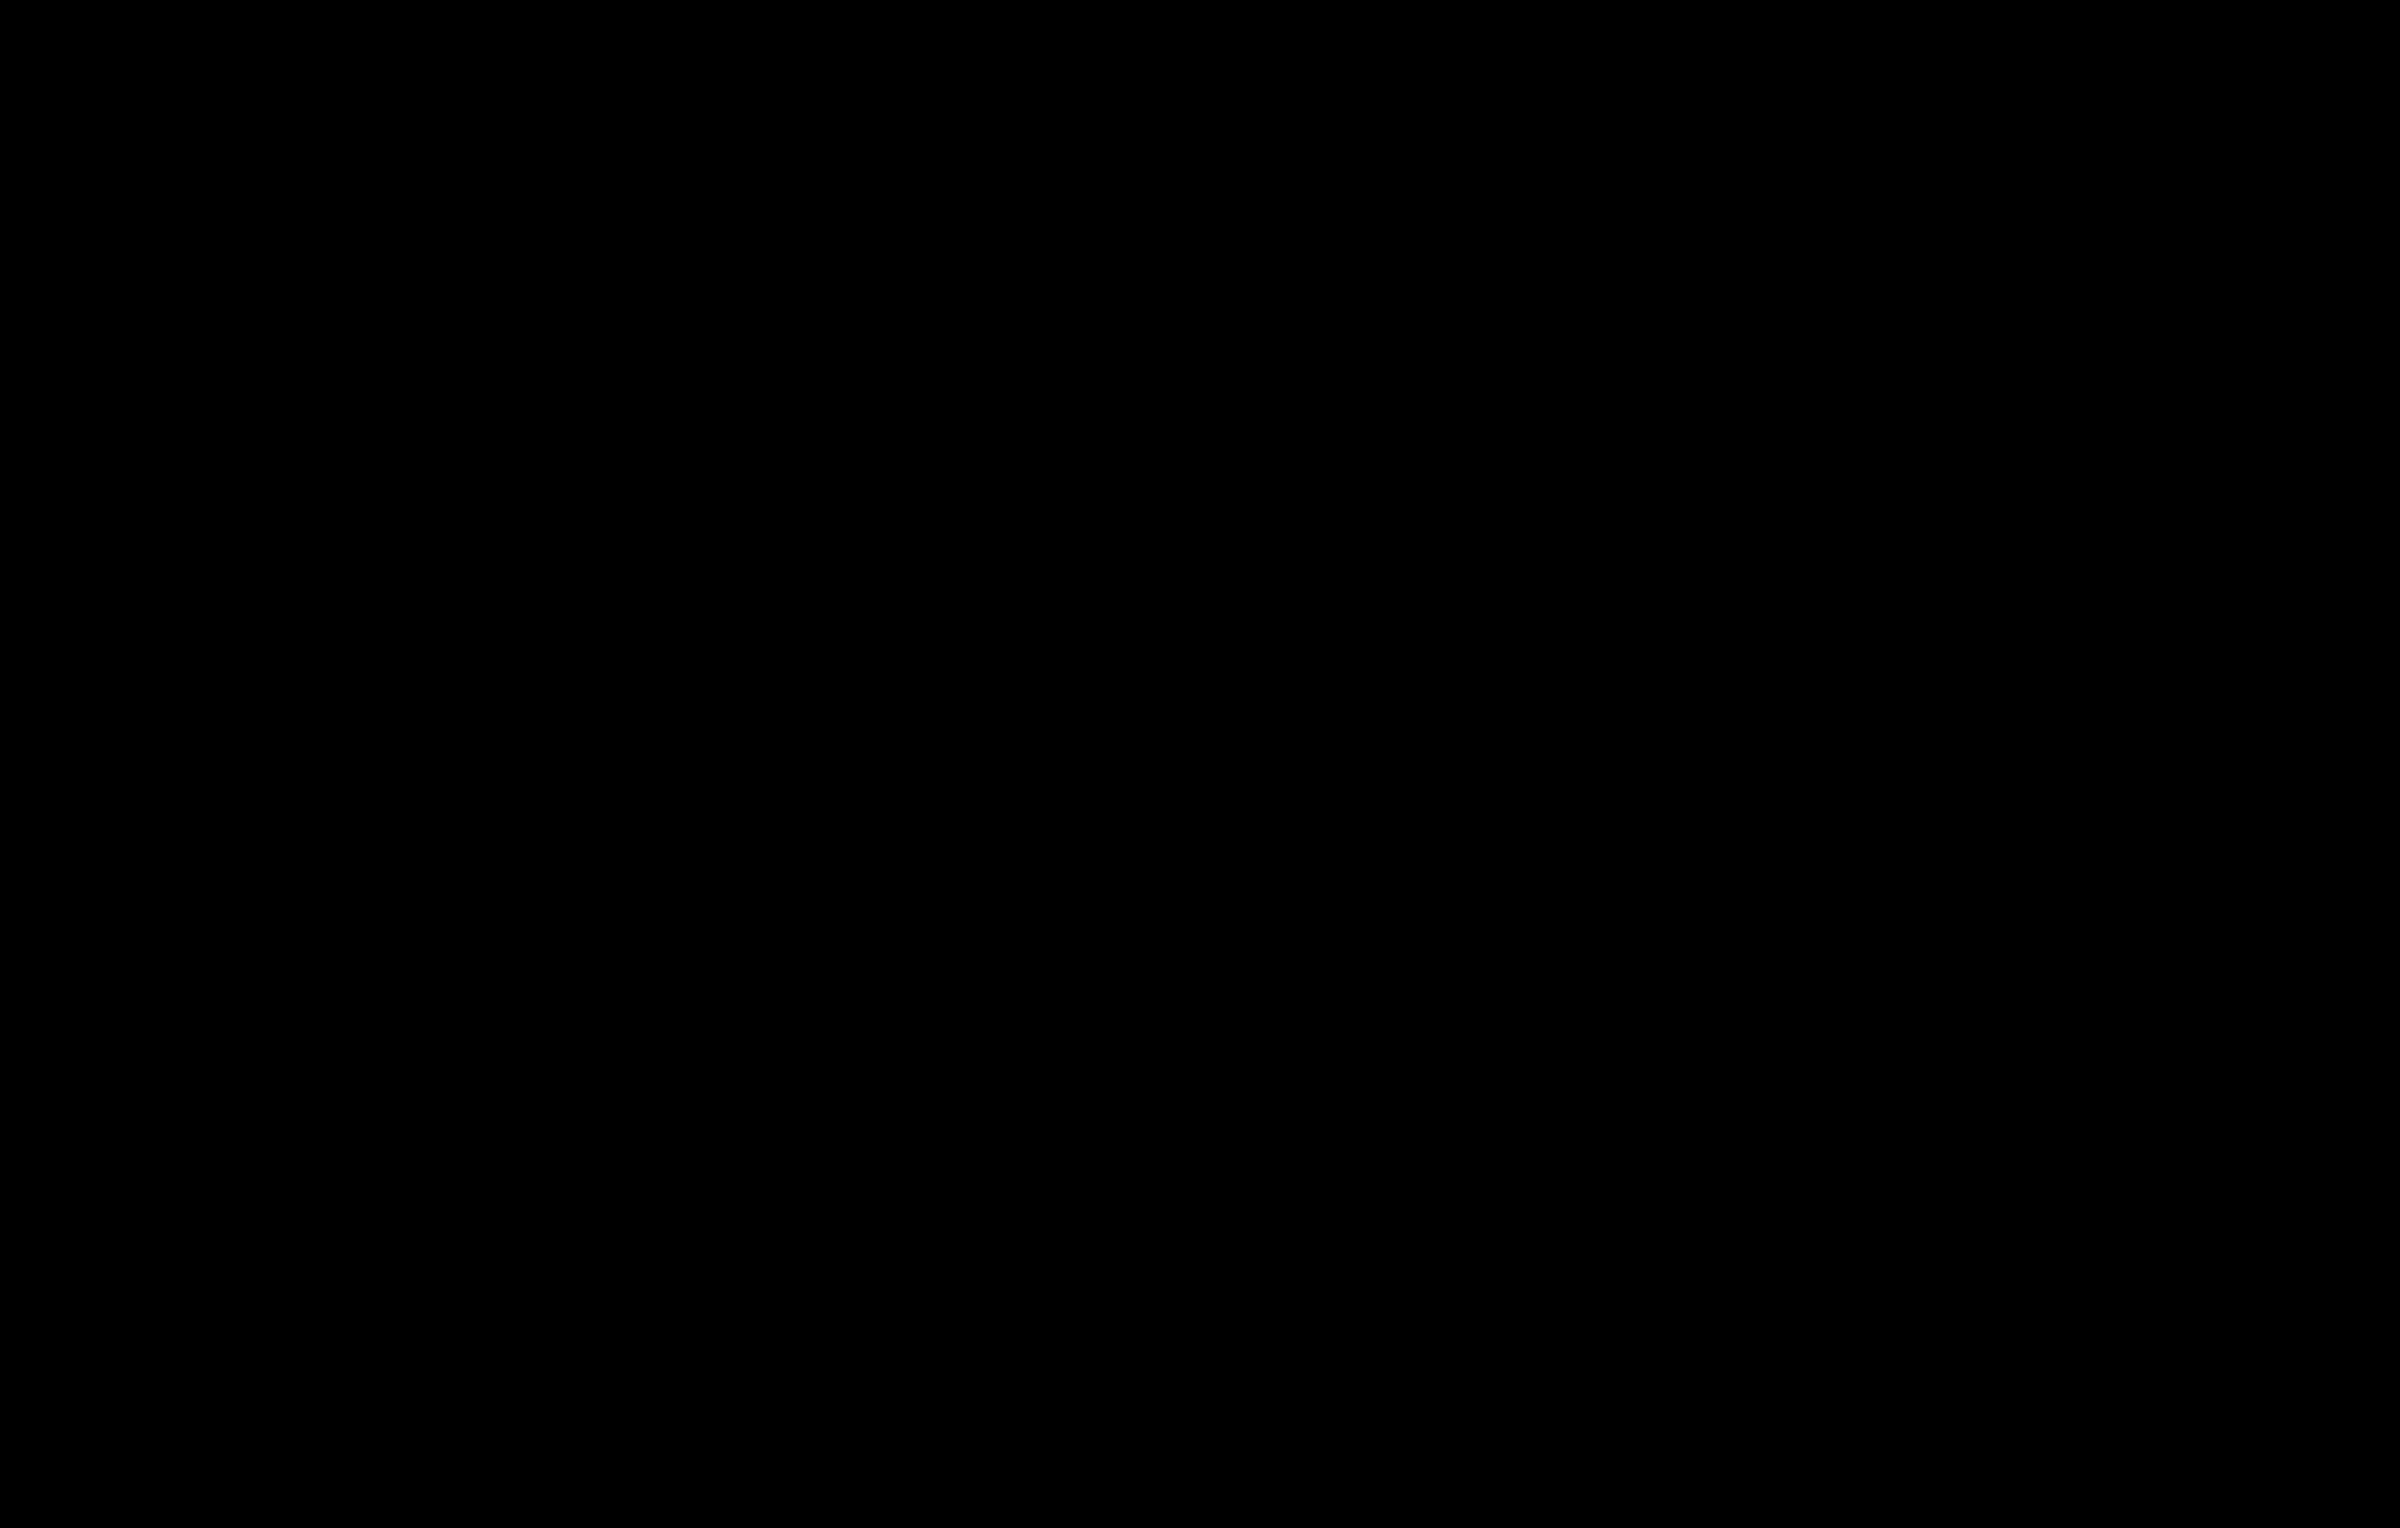 graphic black and white stock Splat nicholasjudy big image. Slime clipart silhouette